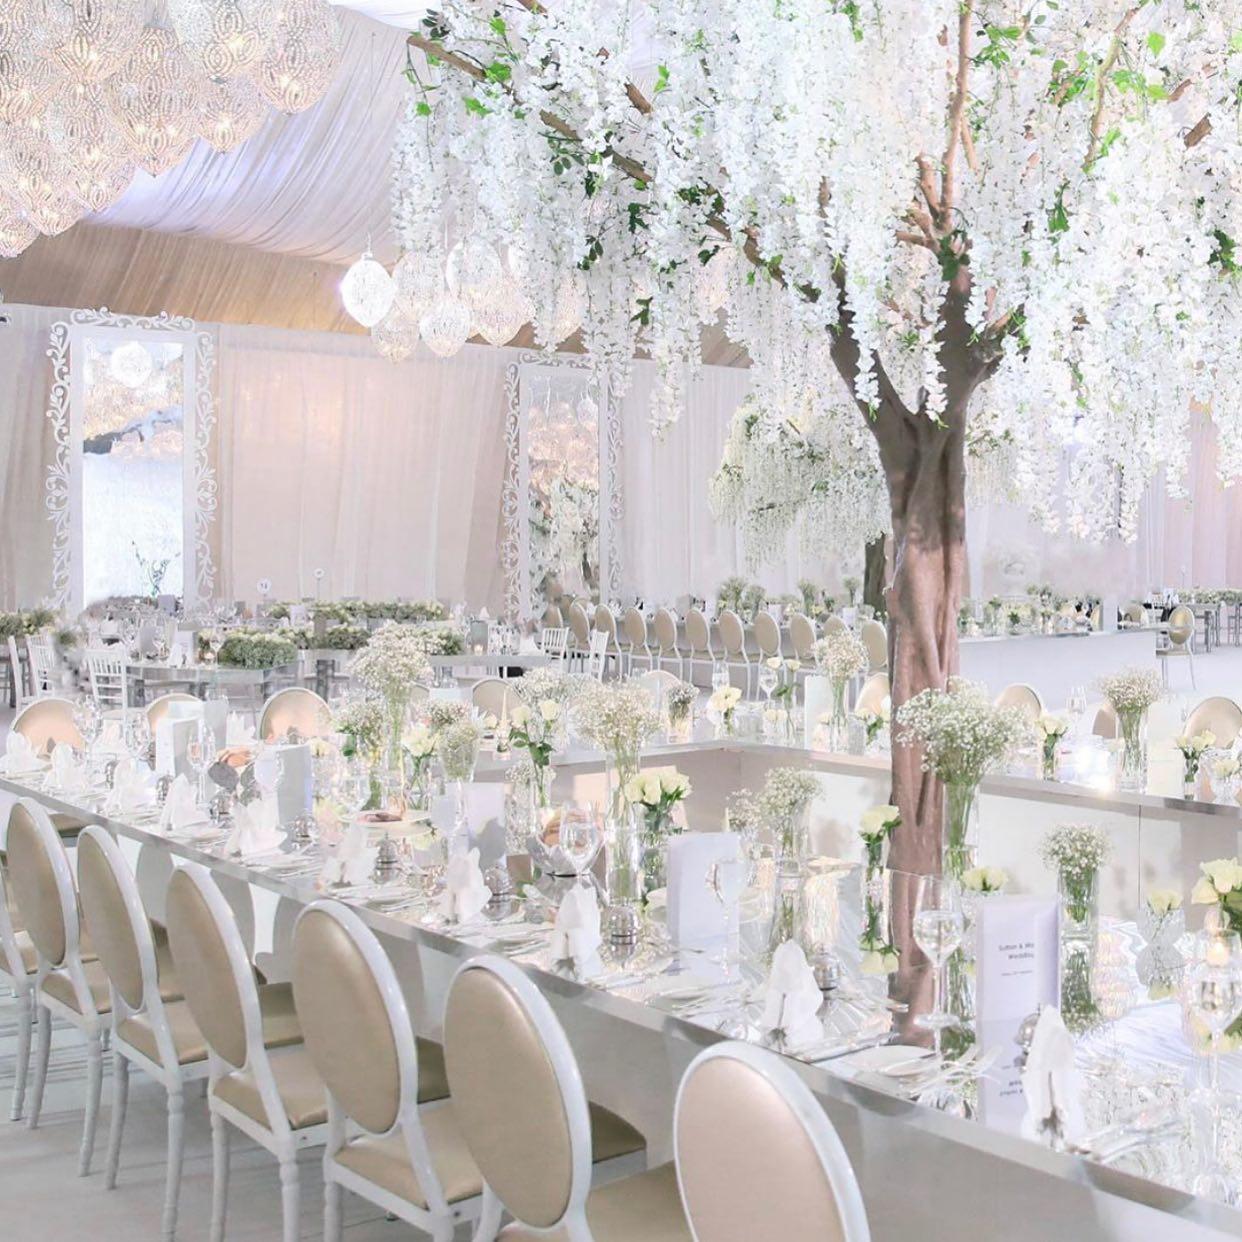 Olivier Dolz wedding planner Dubai - Wedding Hub - 02